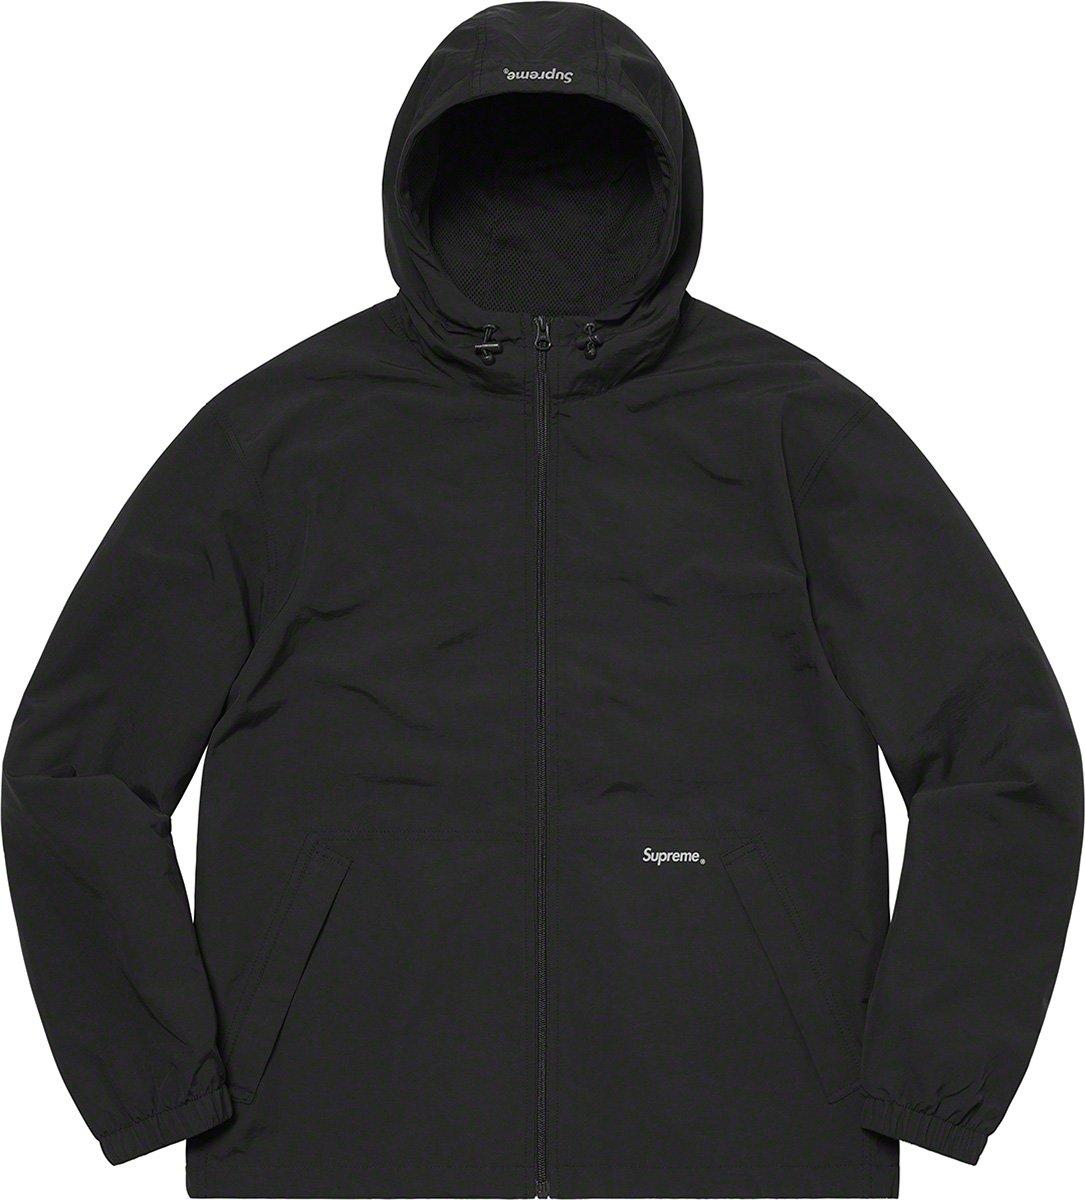 supreme 2021ss シュプリーム 2021春夏 week4 ヒステリックグラマー Reflective Zip Hooded Jacket